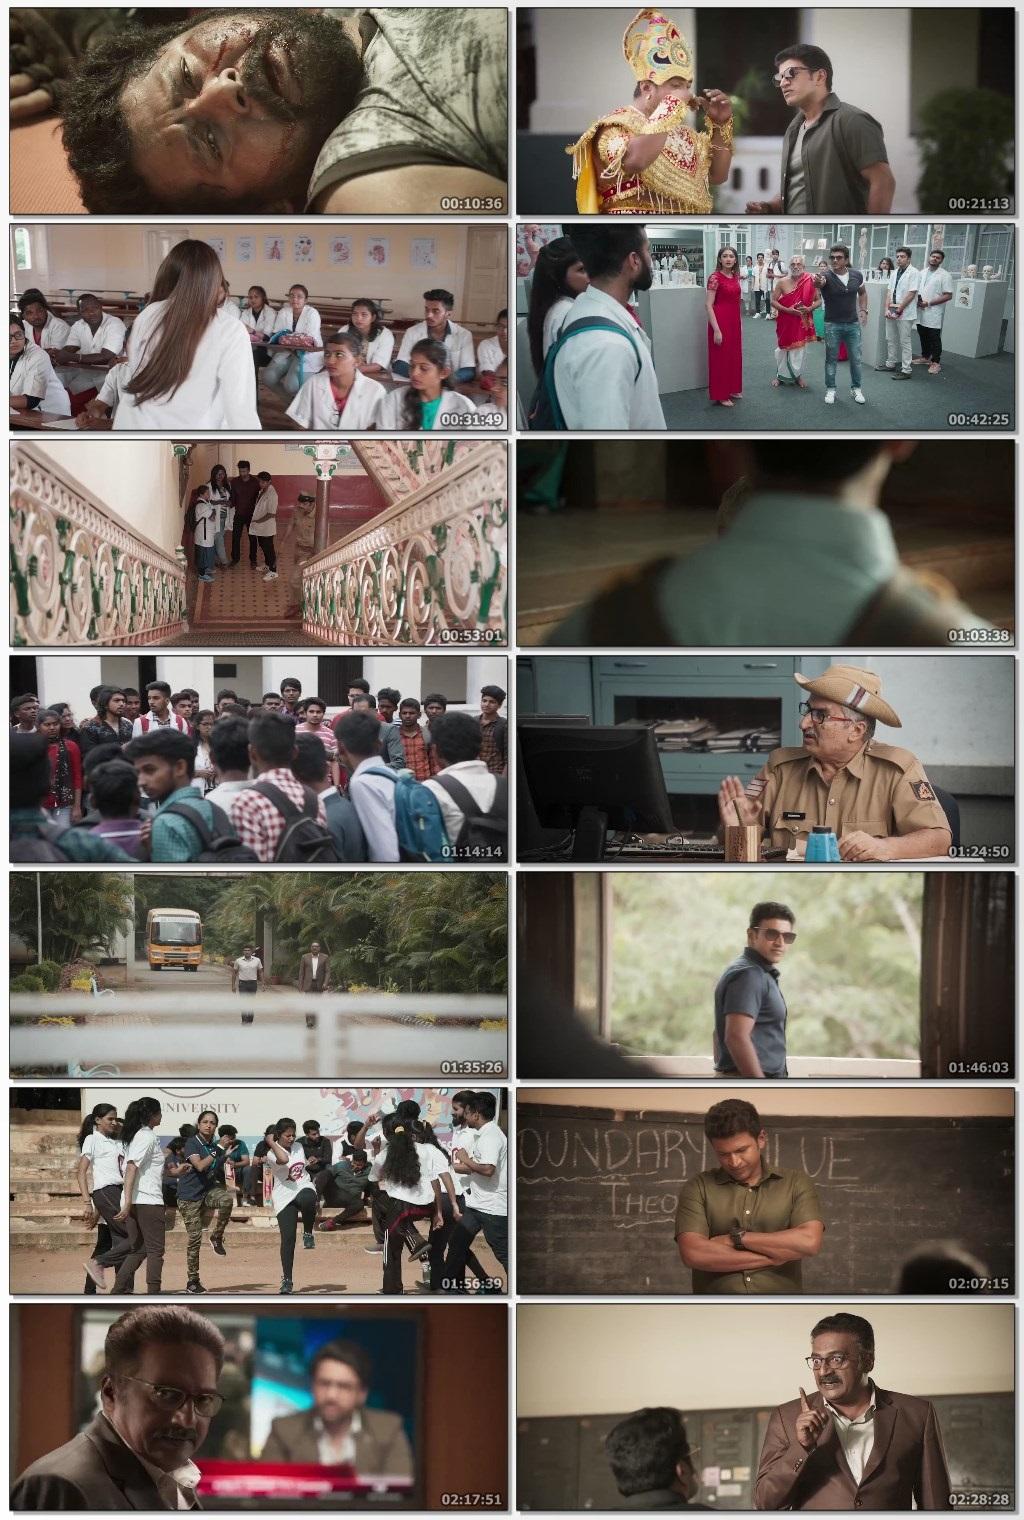 Yuvarathnaa-2021-www-9kmovies-cool-Kannada-720p-HDRip-ESubs-1-3-GB-mkv-thumbs